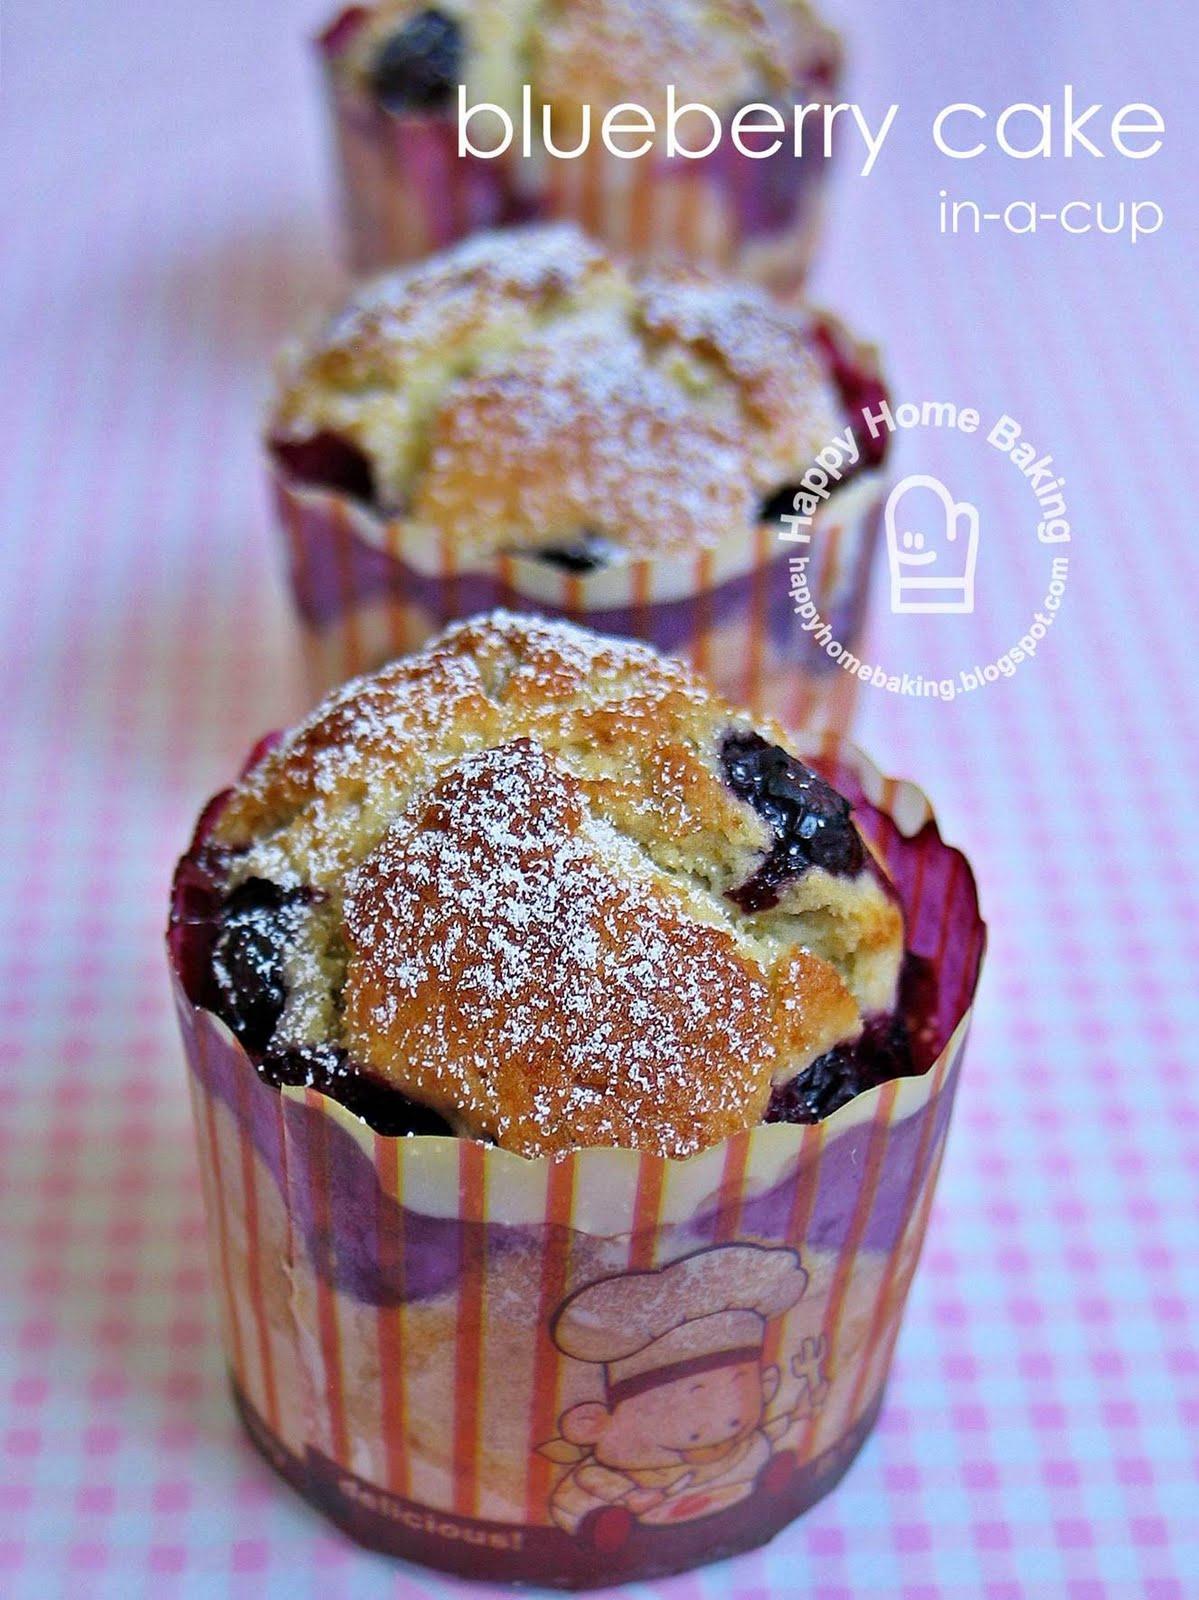 http://2.bp.blogspot.com/-Tv3WBnbSxfQ/TsXGI64HdPI/AAAAAAAAHPk/4_1fC8hOz6A/s1600/blueberry%2Bcake-in-cup%2B2.JPG